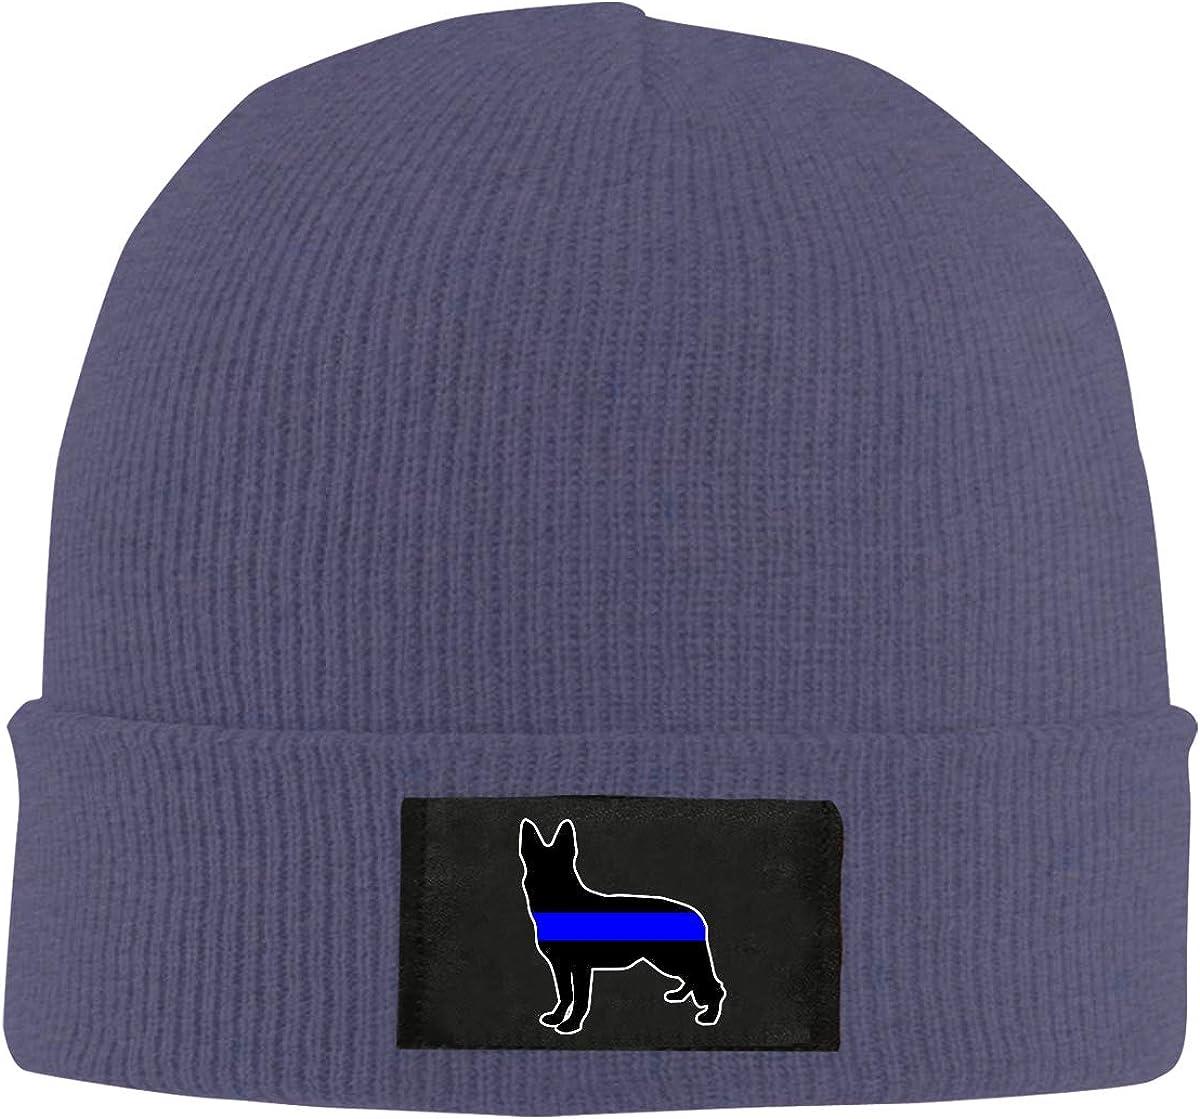 100/% Acrylic Daily Skiing Cap BF5Y6z/&MA Unisex German Shepherd Thin Blue Line Knitting Hat